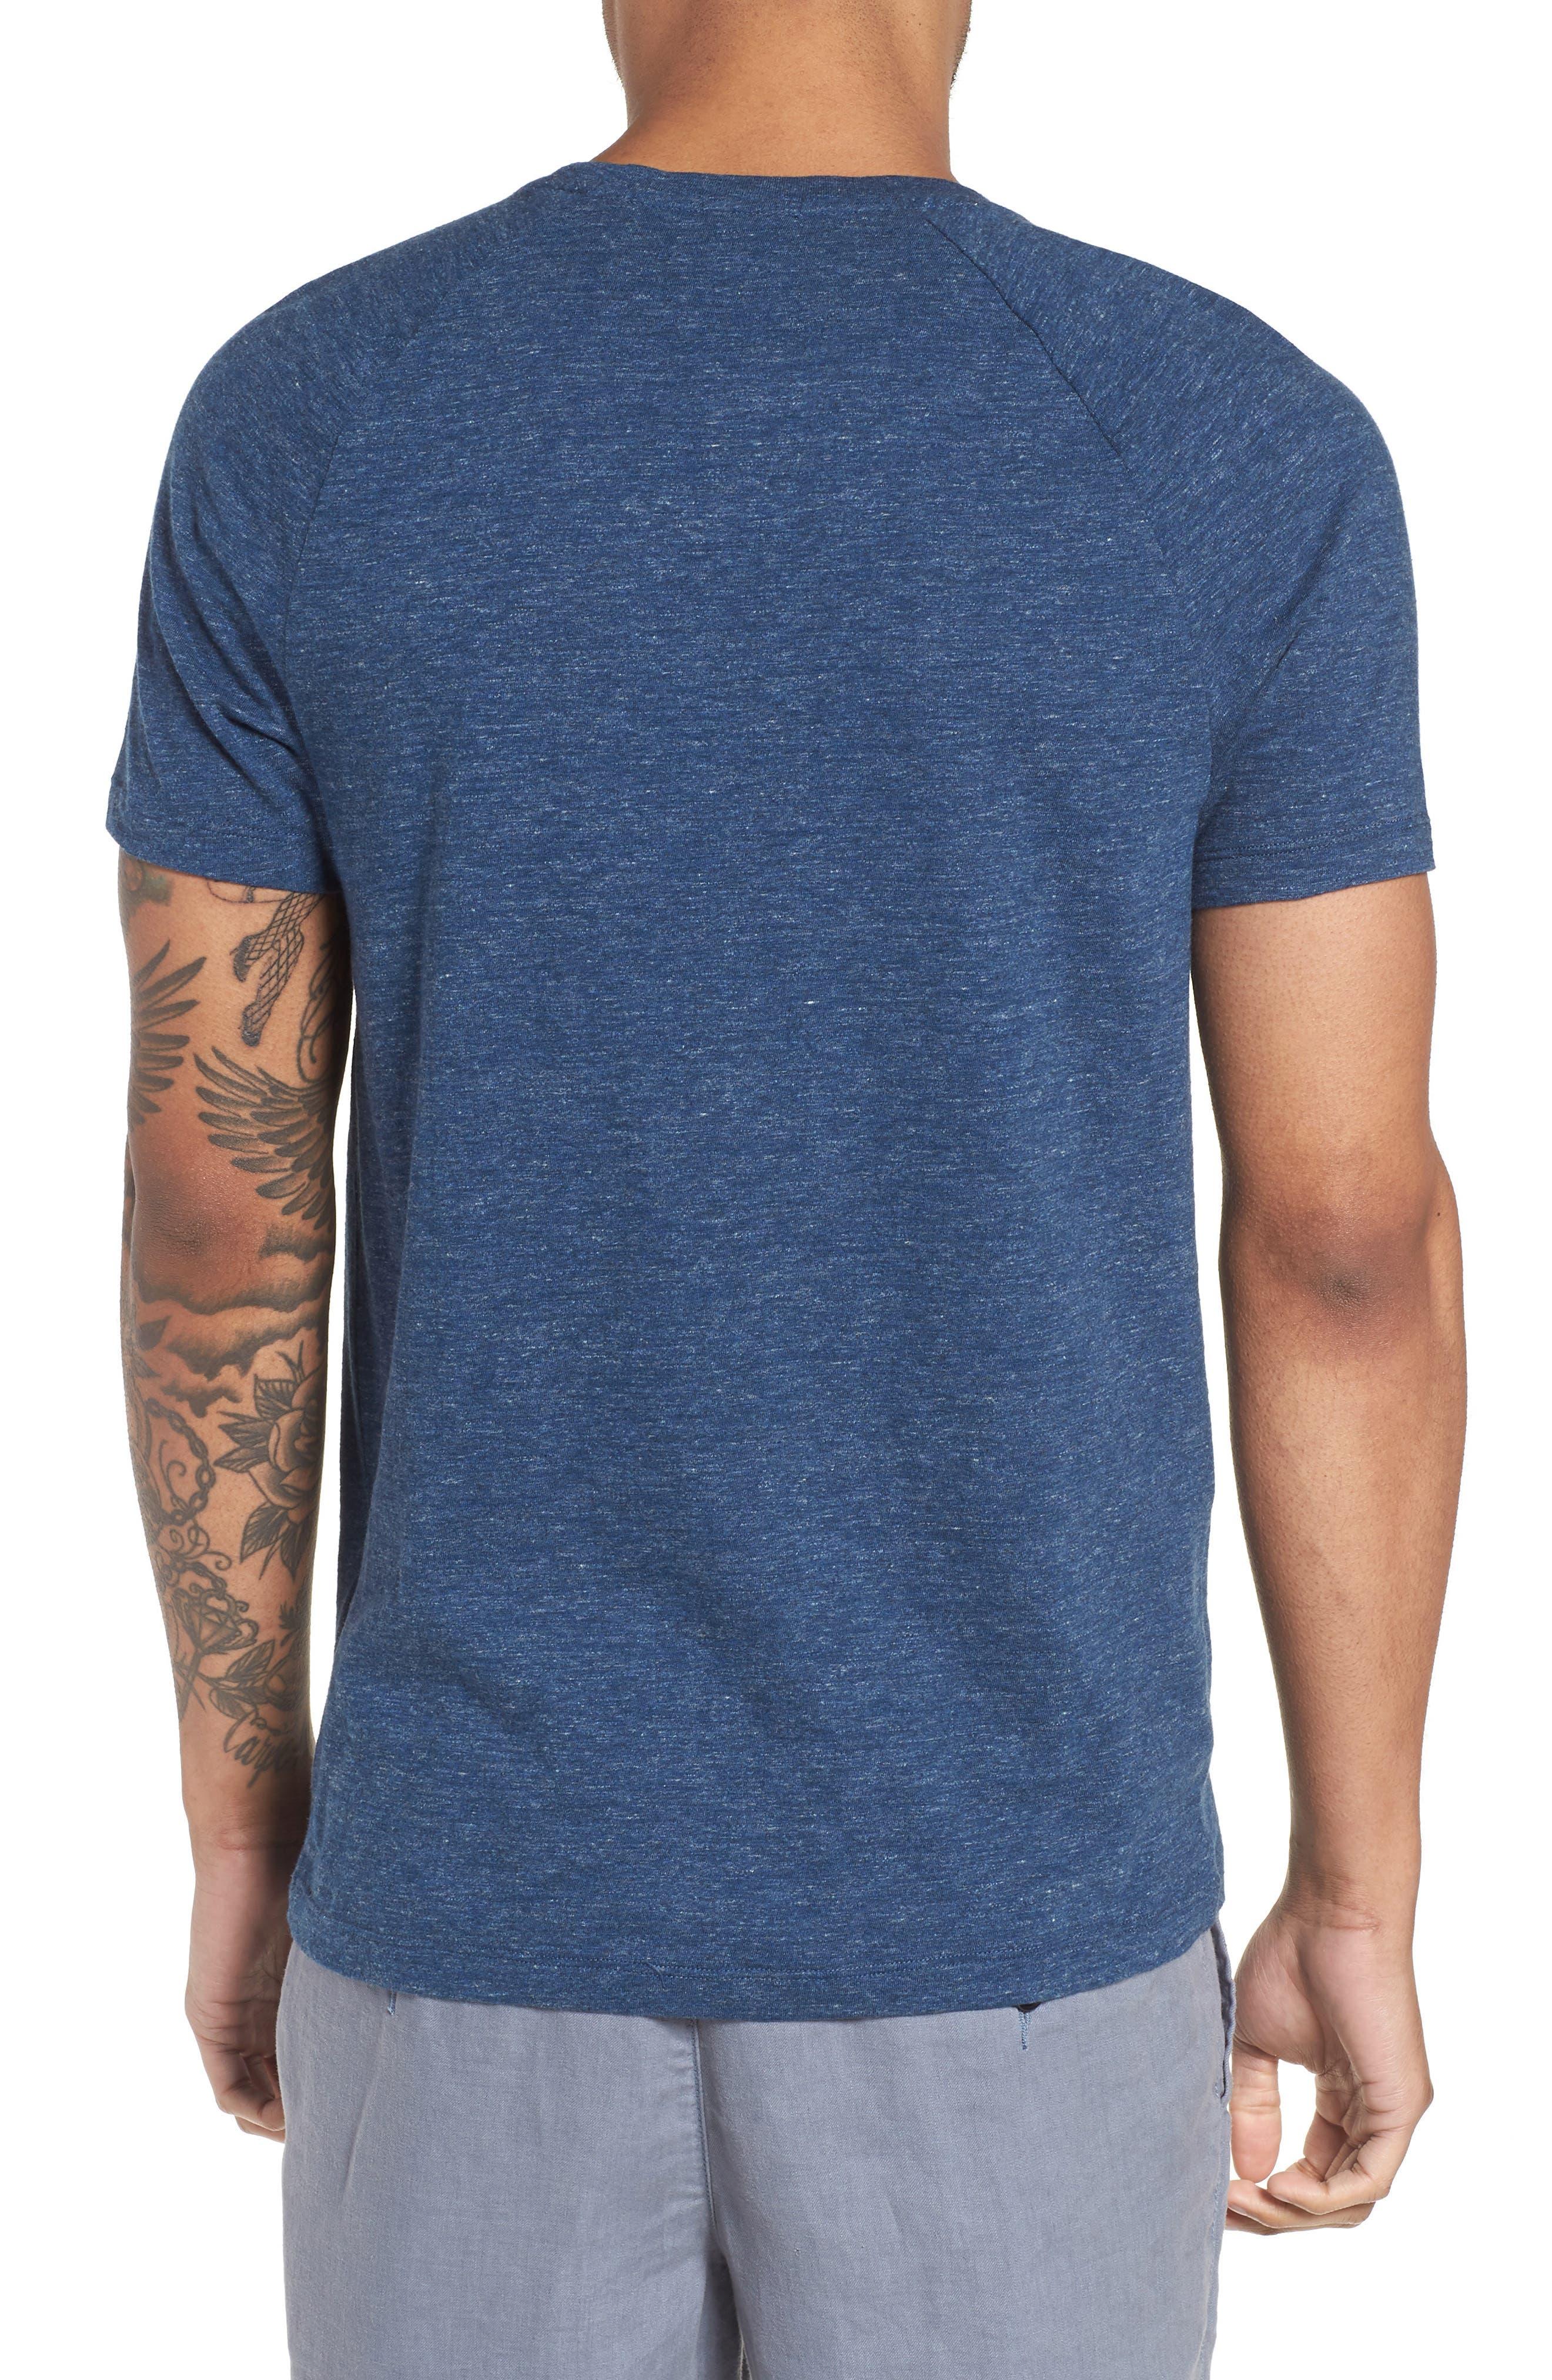 Tessler Slim Fit Pocket T-Shirt,                             Alternate thumbnail 2, color,                             Blue